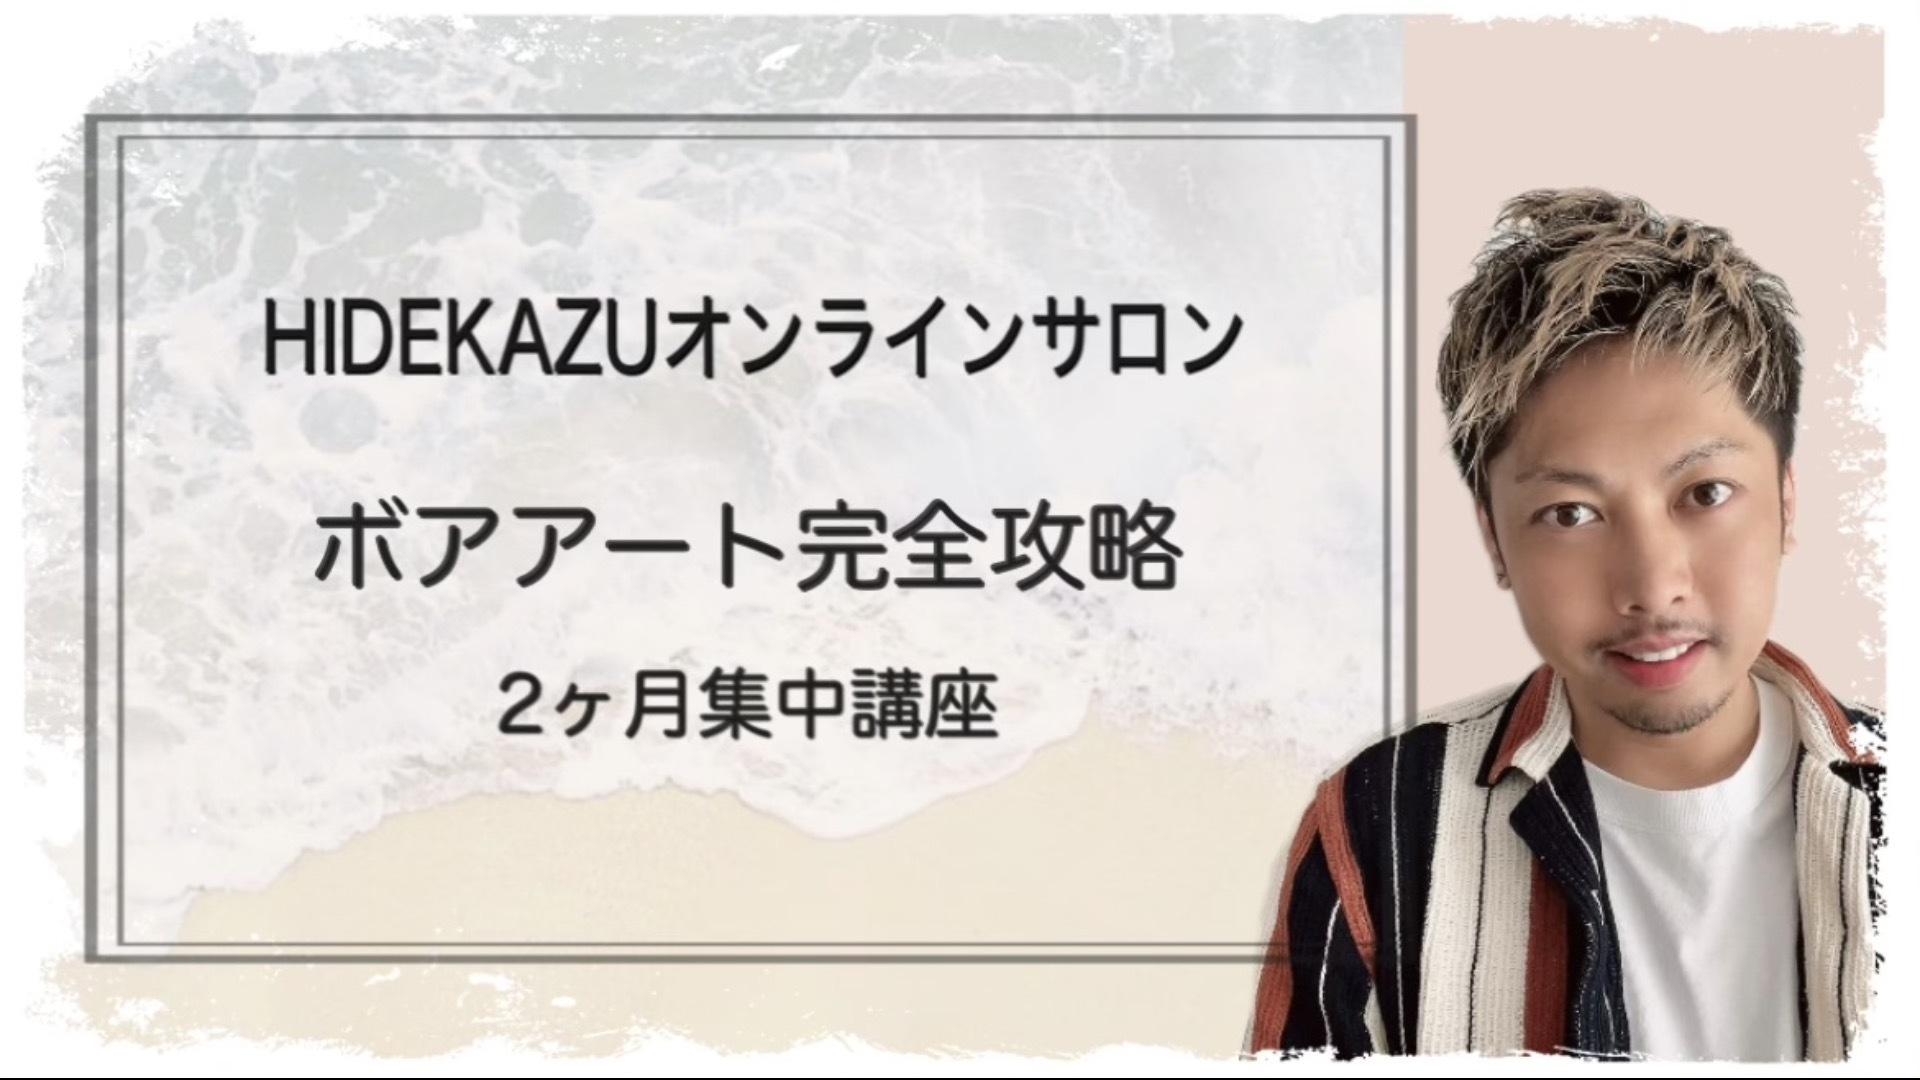 HIDEKAZUが教えるボアネイル完全攻略レッスン ~2ヶ月集中講座~